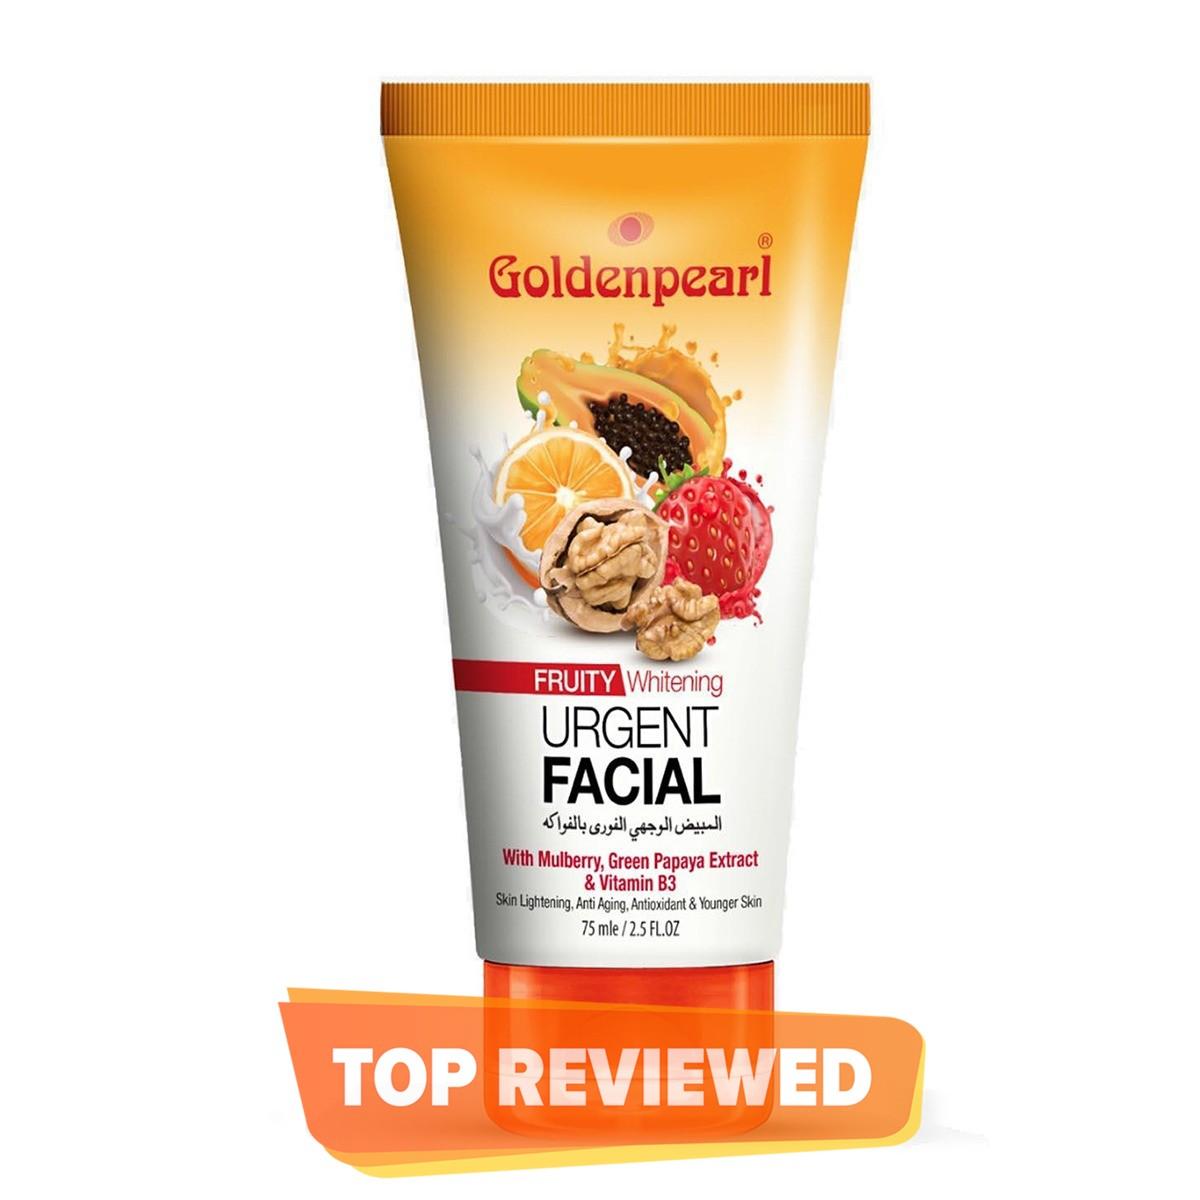 Golden Pearl Whitening Urgent Facial Fruity 75 ml tube